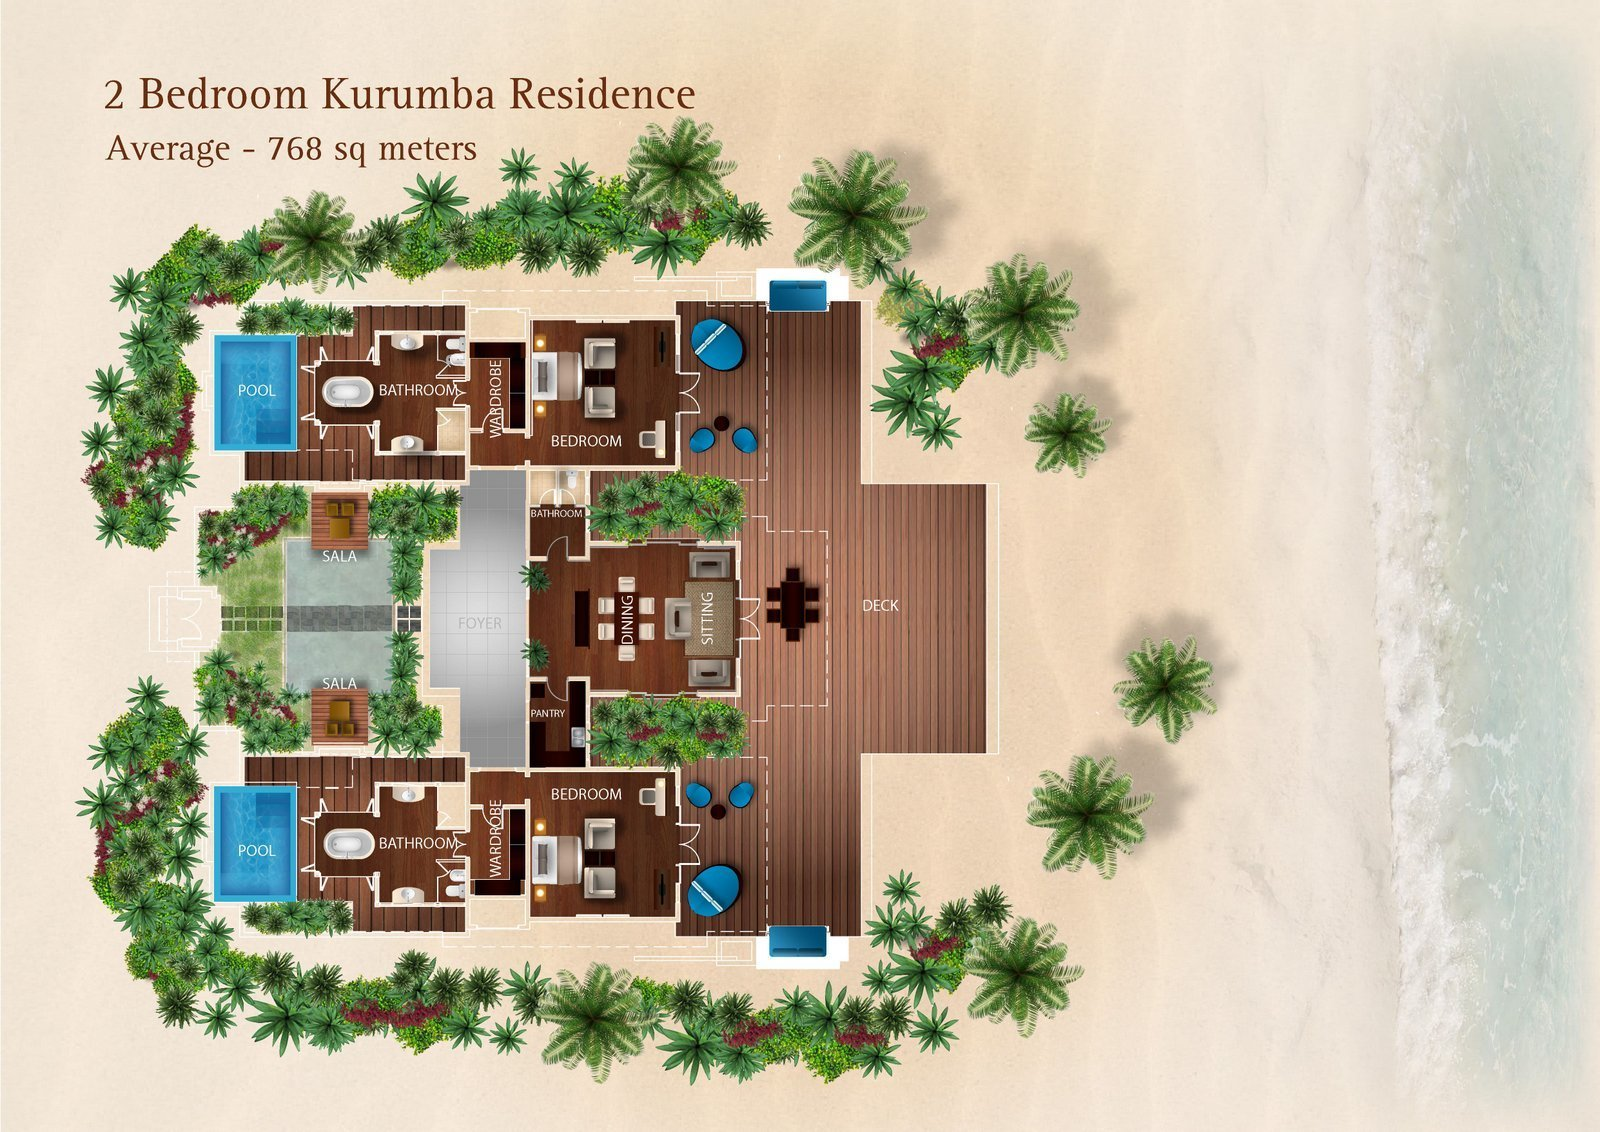 Мальдивы, отель Kurumba Maldives, план-схема номера Two Bed Room Kurumba Residence